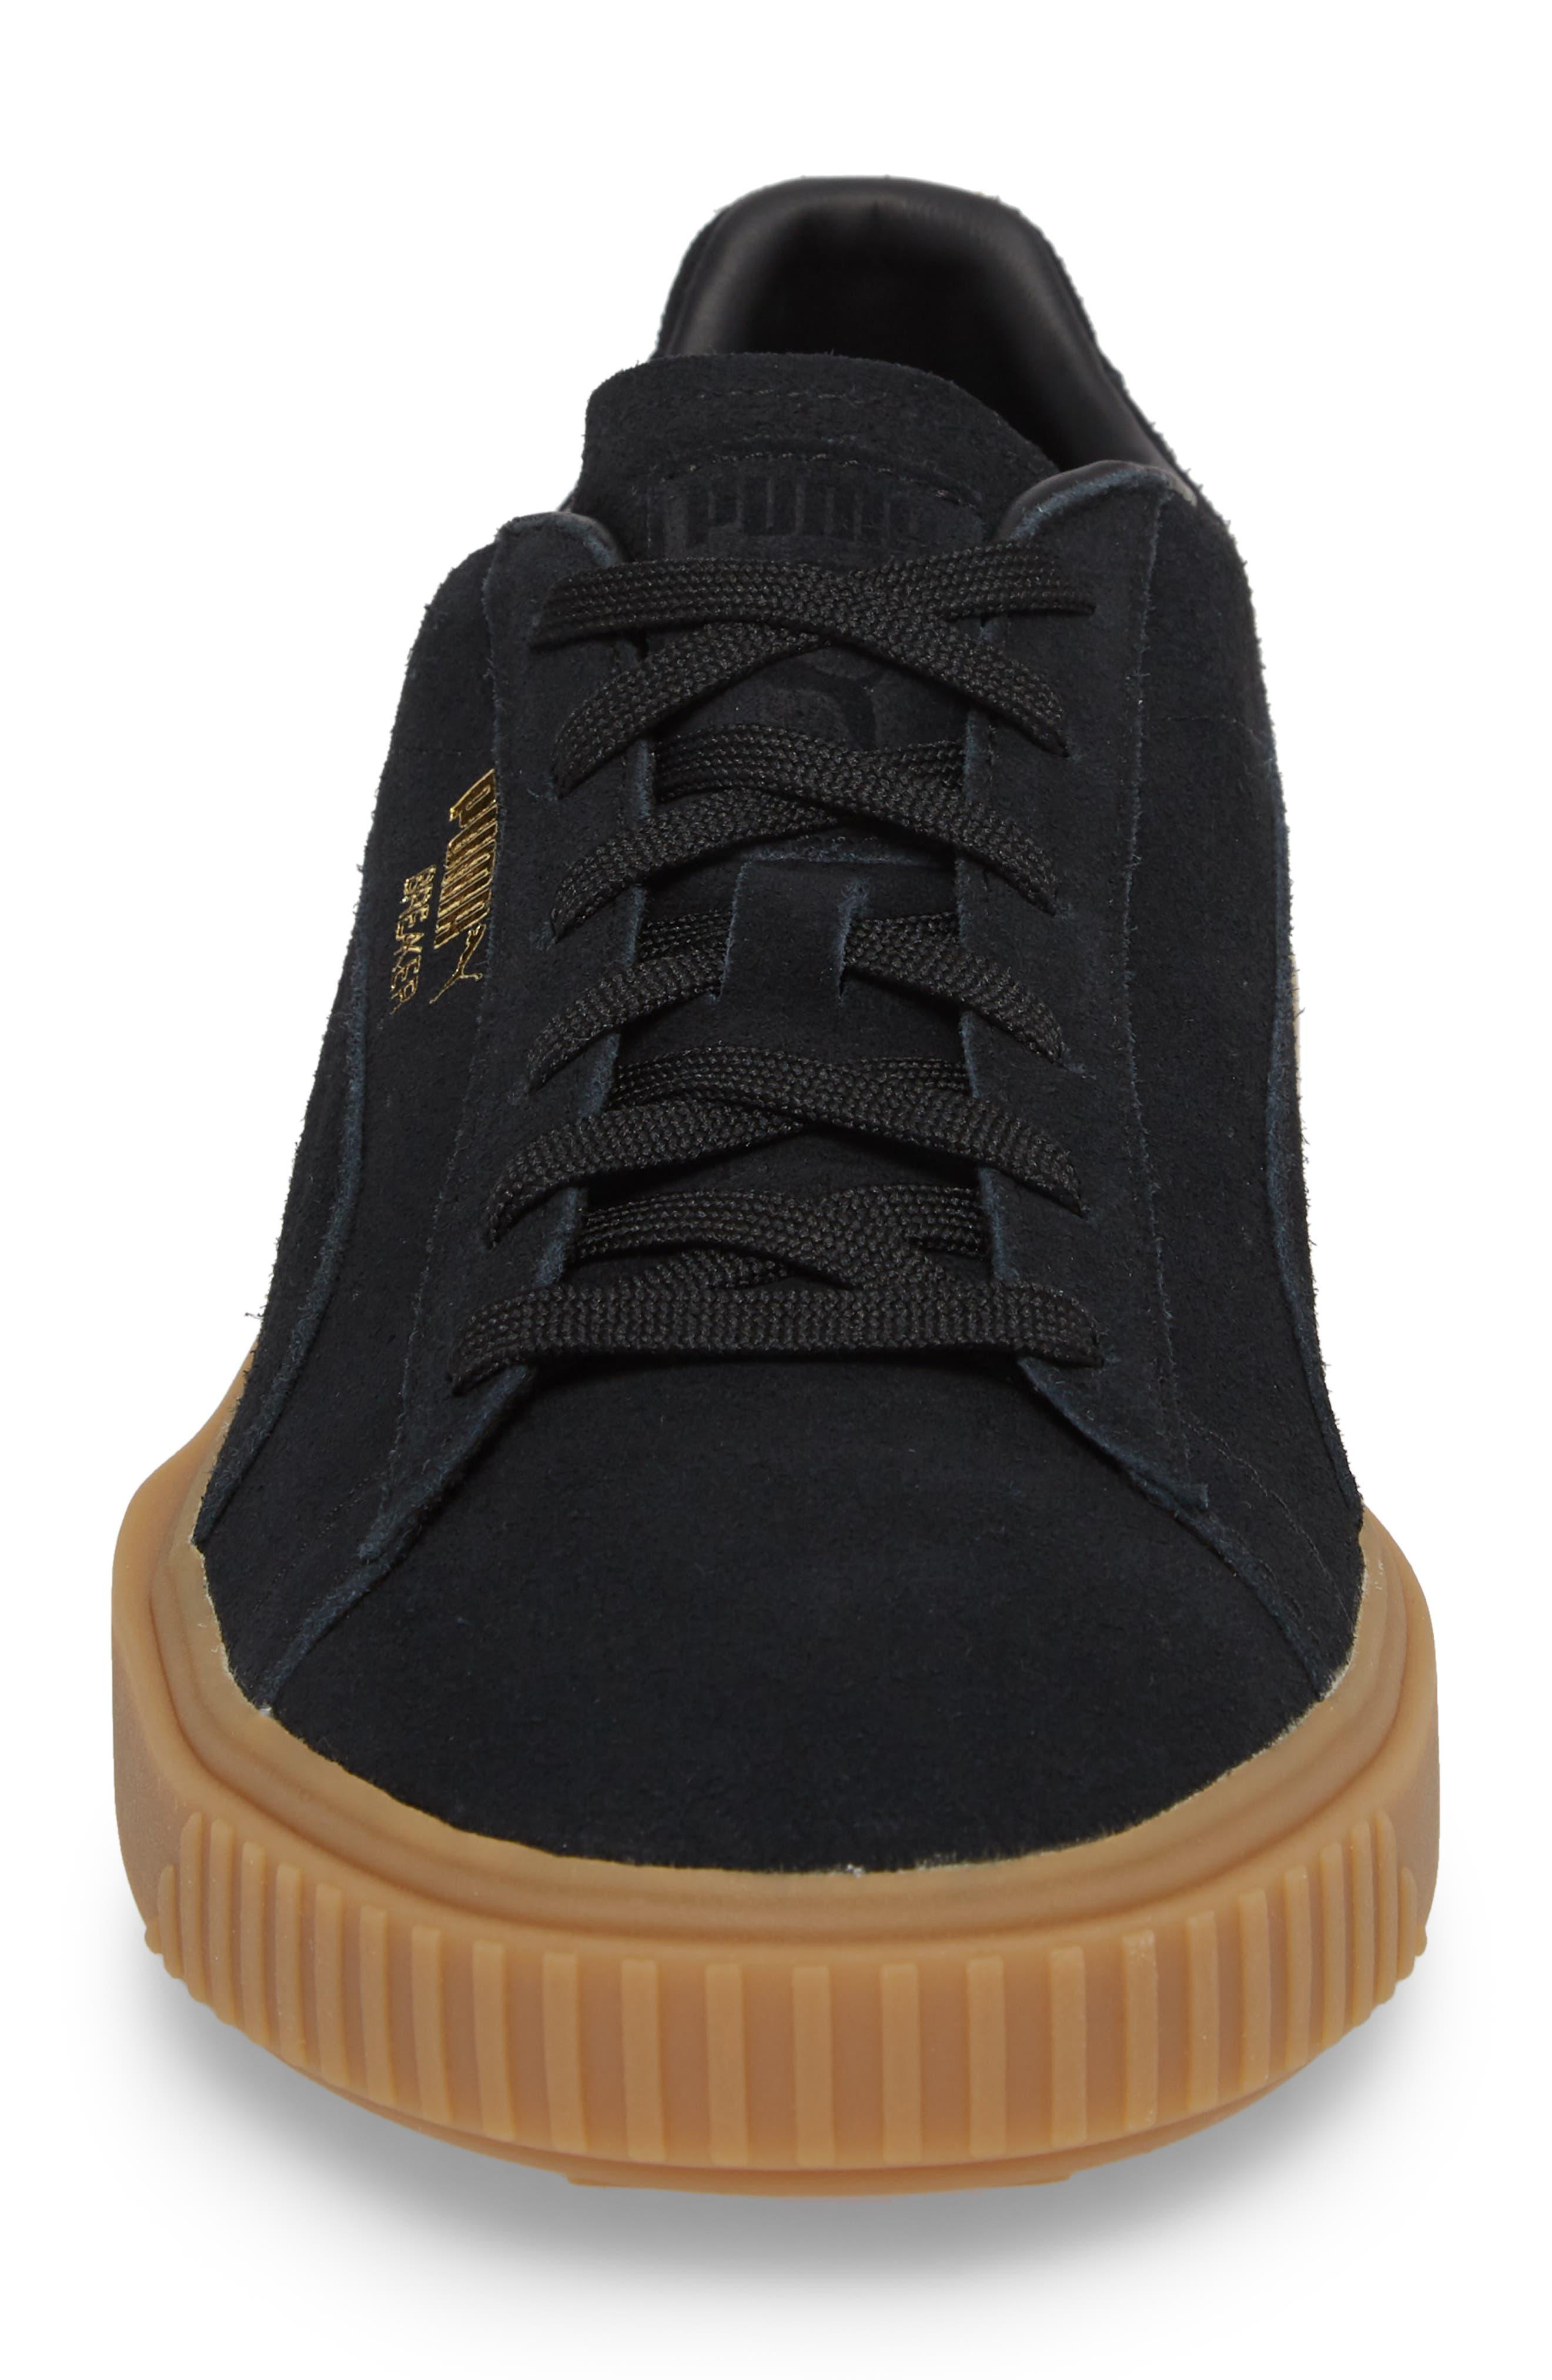 Breaker Suede Gum Low Top Sneaker,                             Alternate thumbnail 7, color,